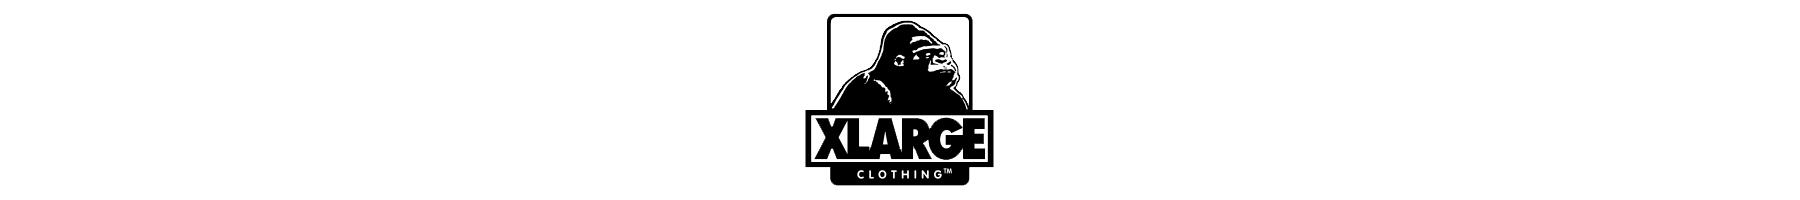 DrJays.com - X-LARGE